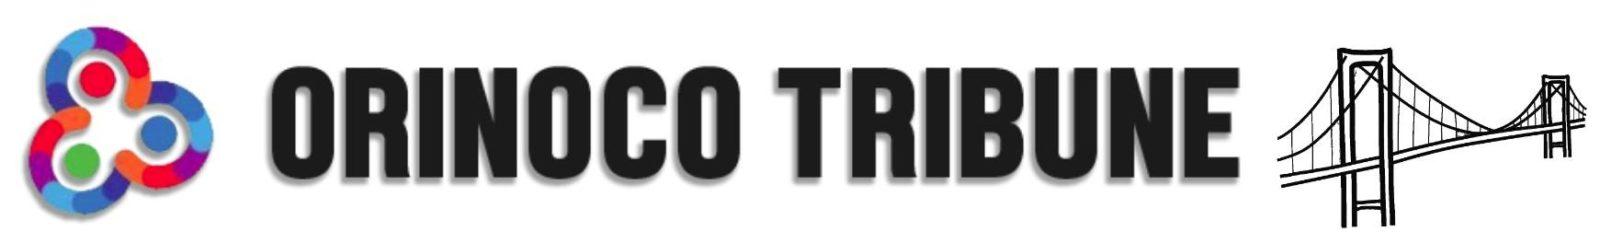 Orinoco Tribune